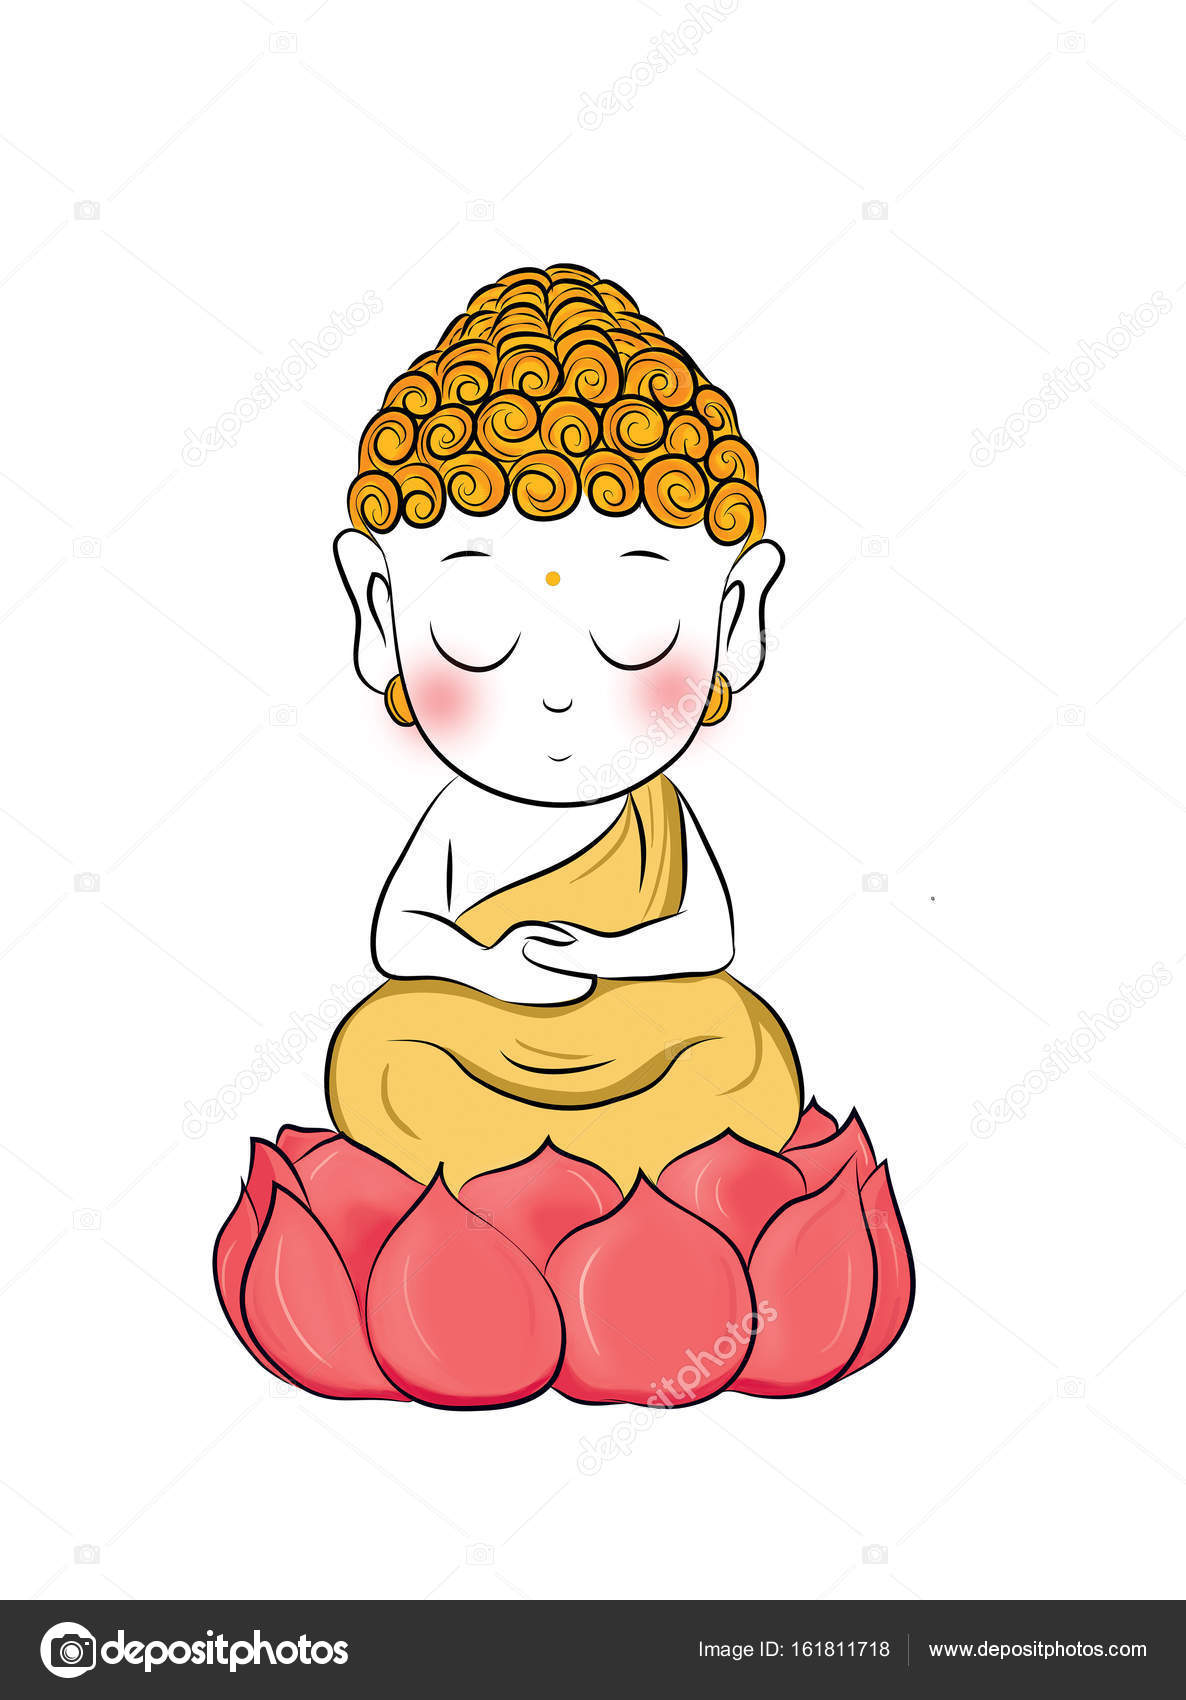 lille buddha dating dating mad hindi